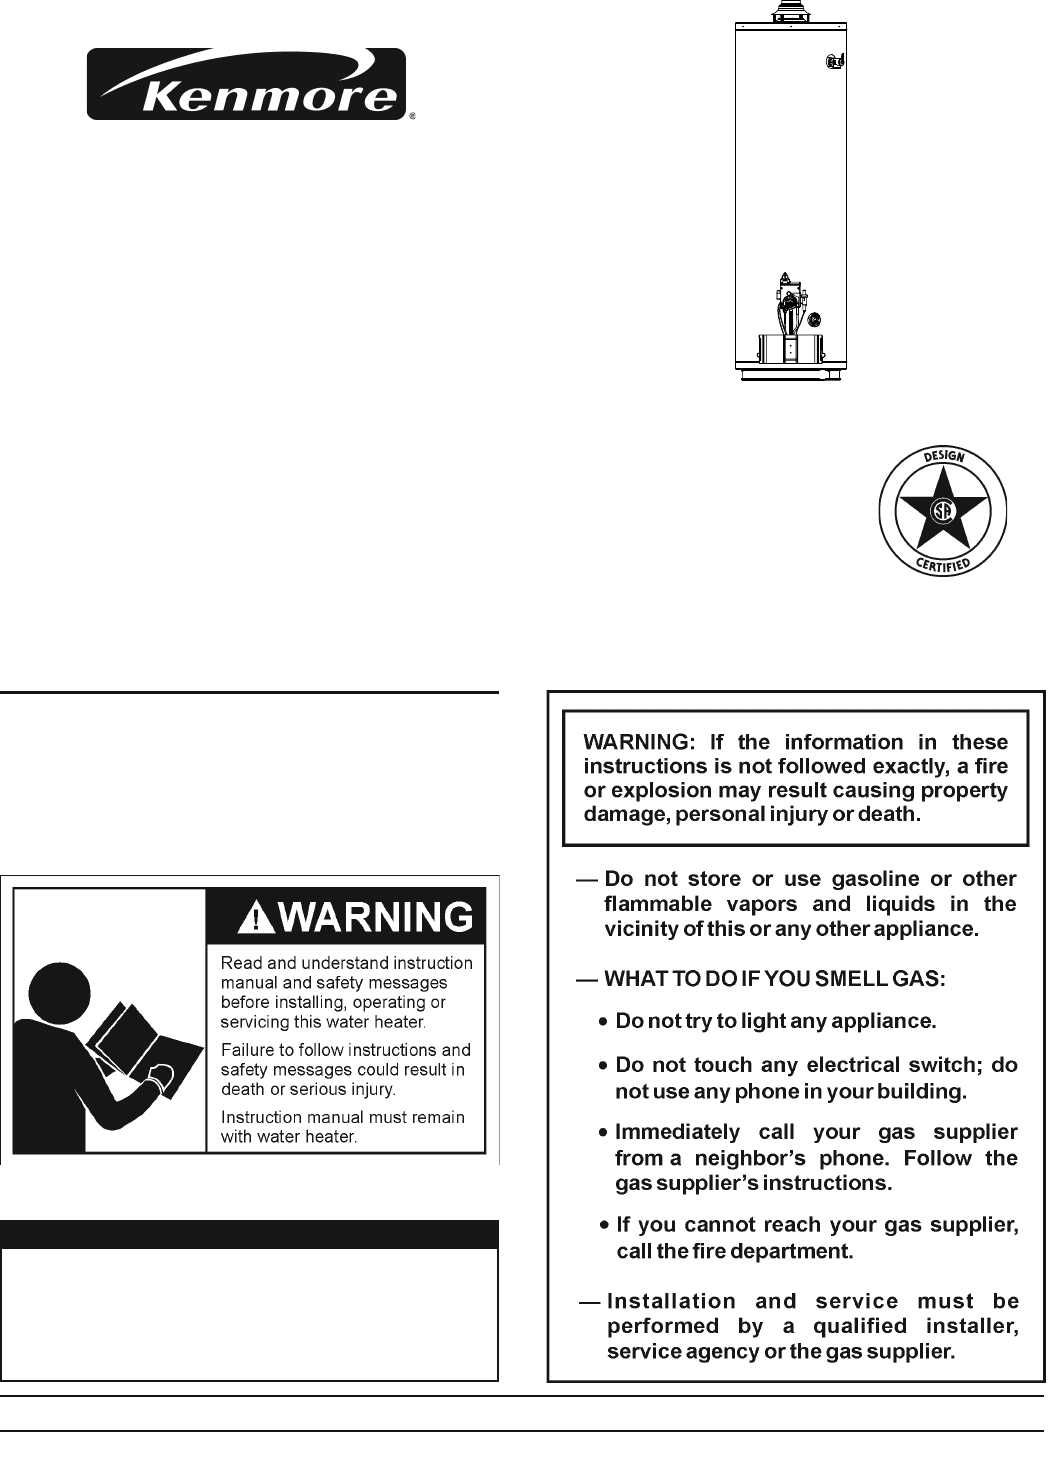 Kenmore Power Miser 153 336333 Users Manual 186496 003 Sears